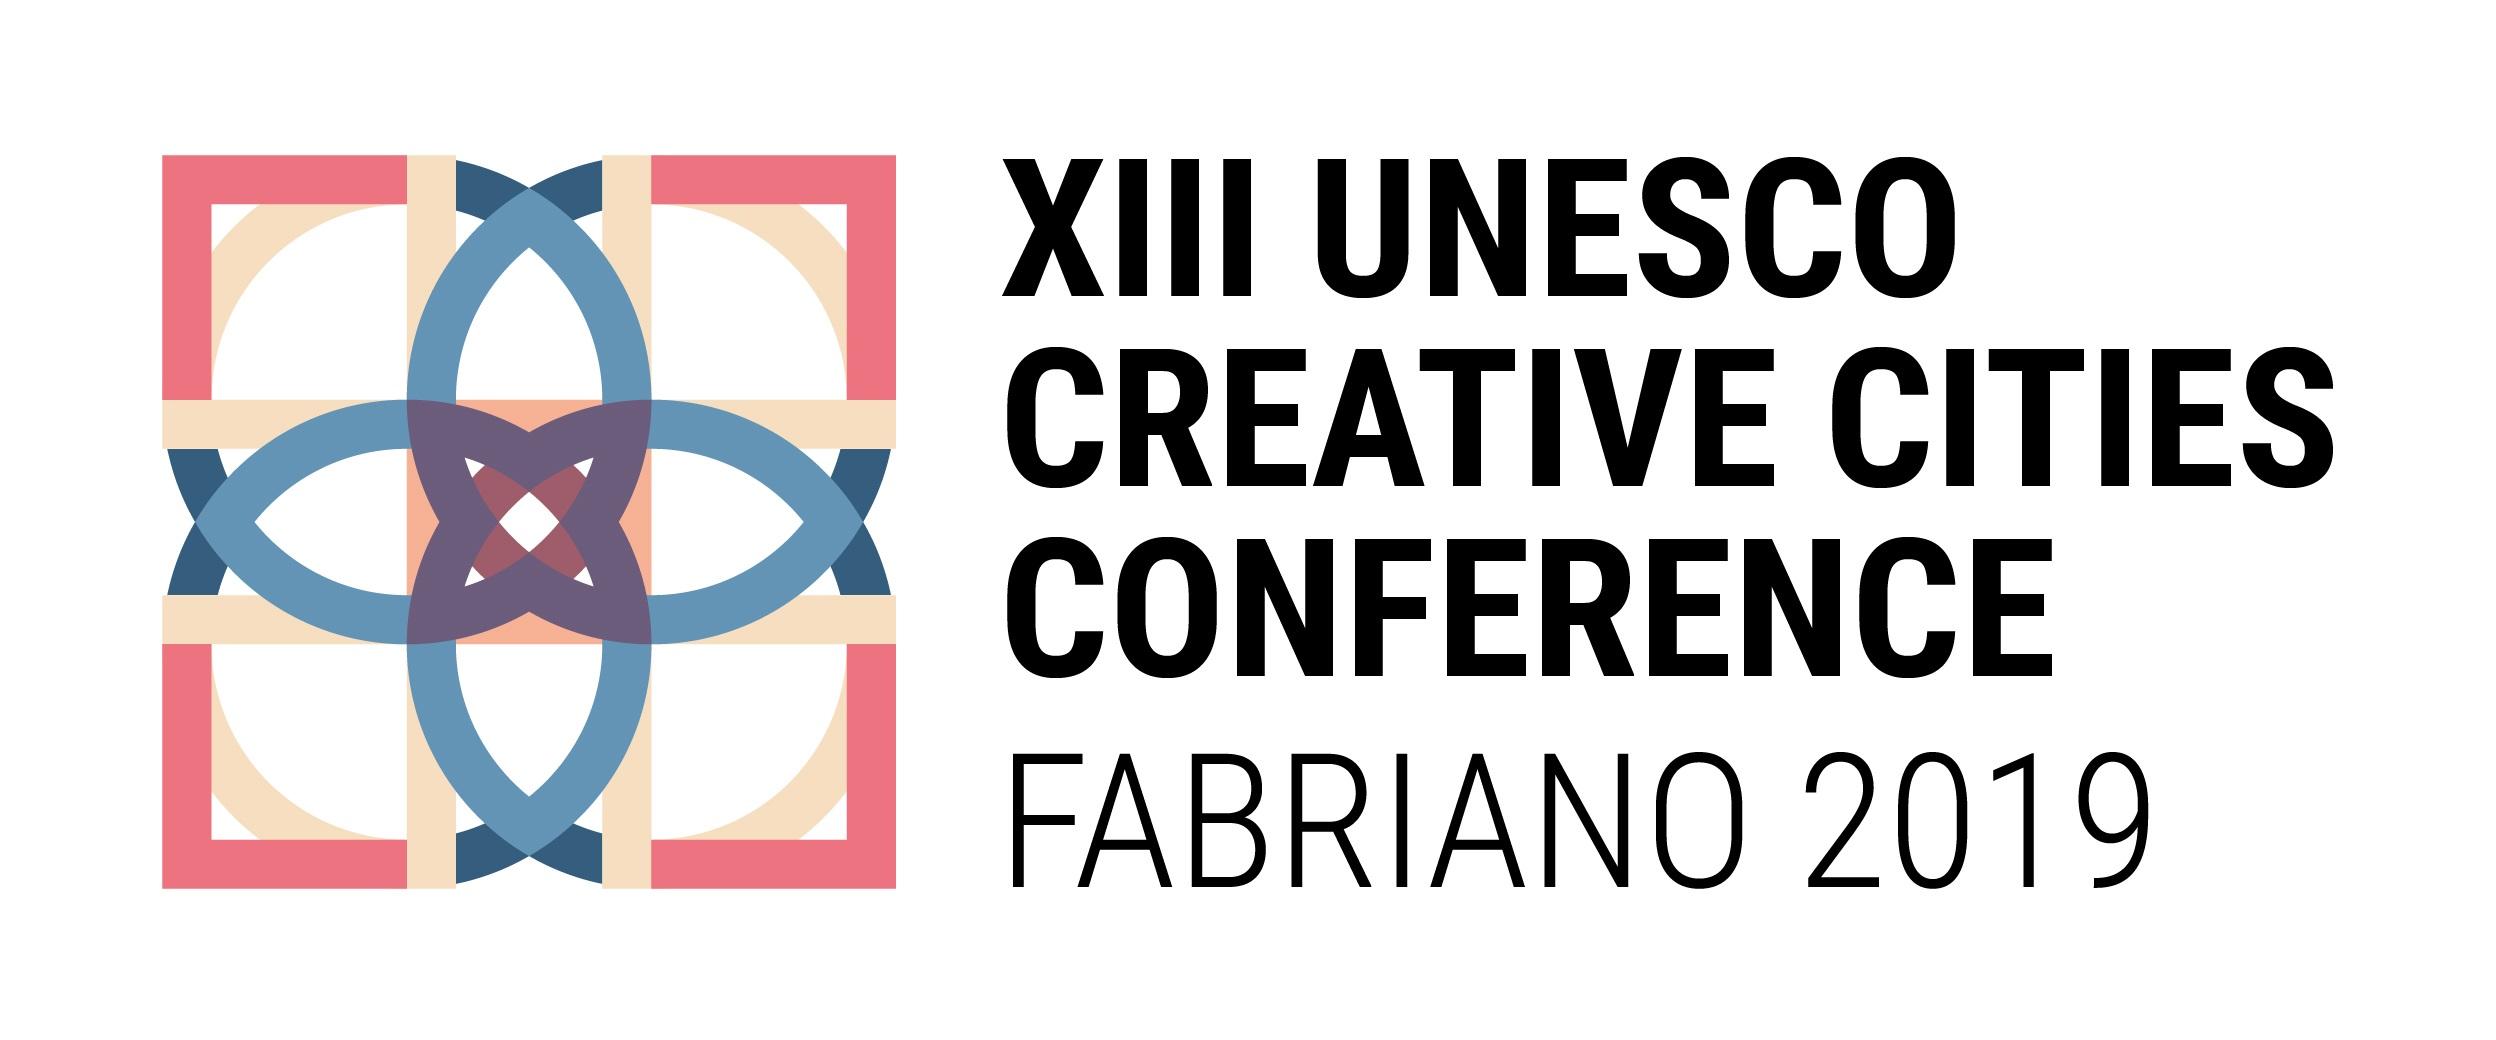 2019 logoannualconference.jpg